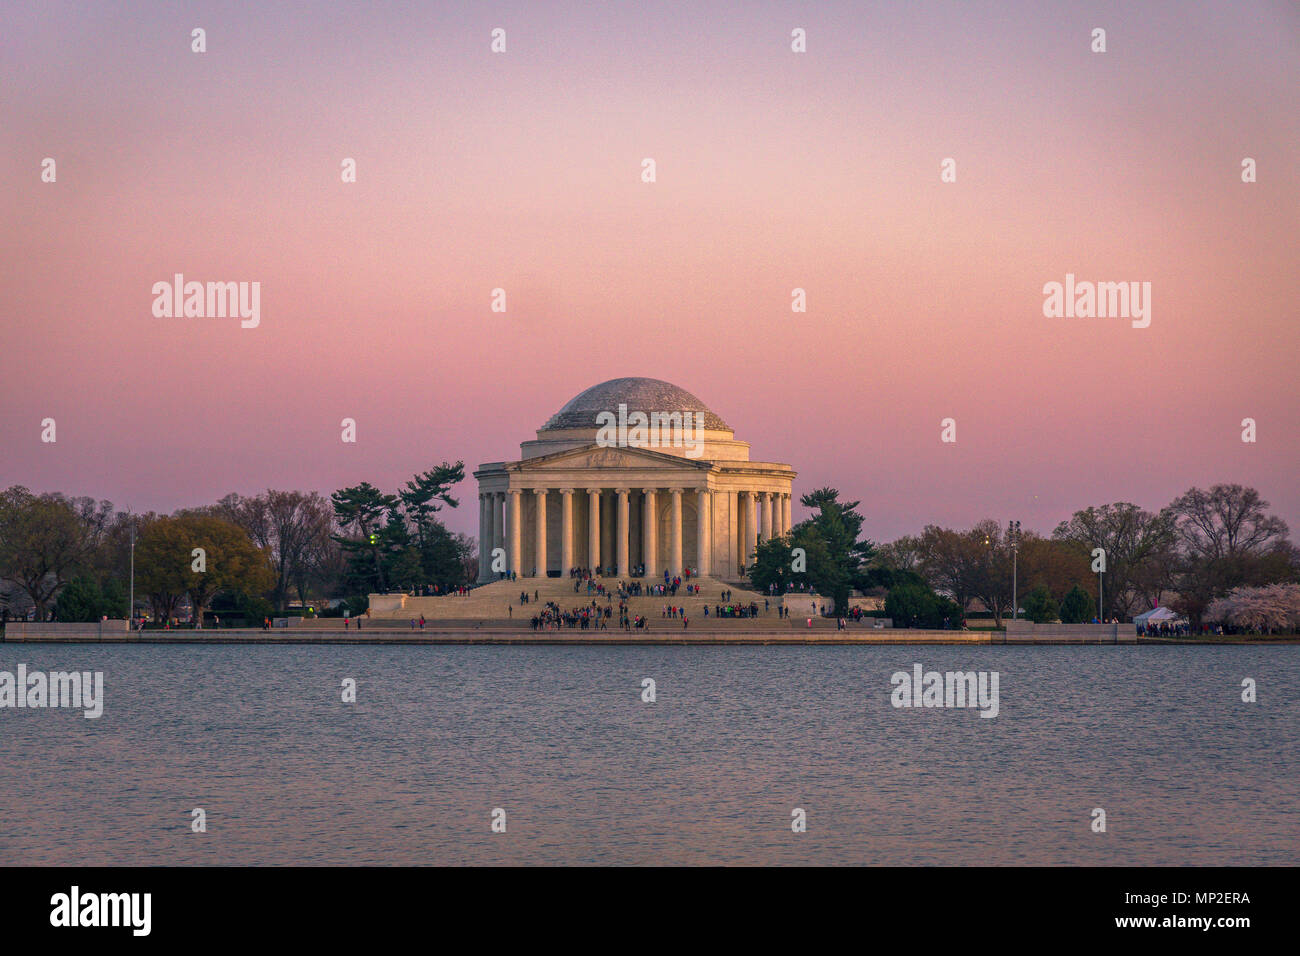 Washington, DC Cherry Blossom Festival Stockbild